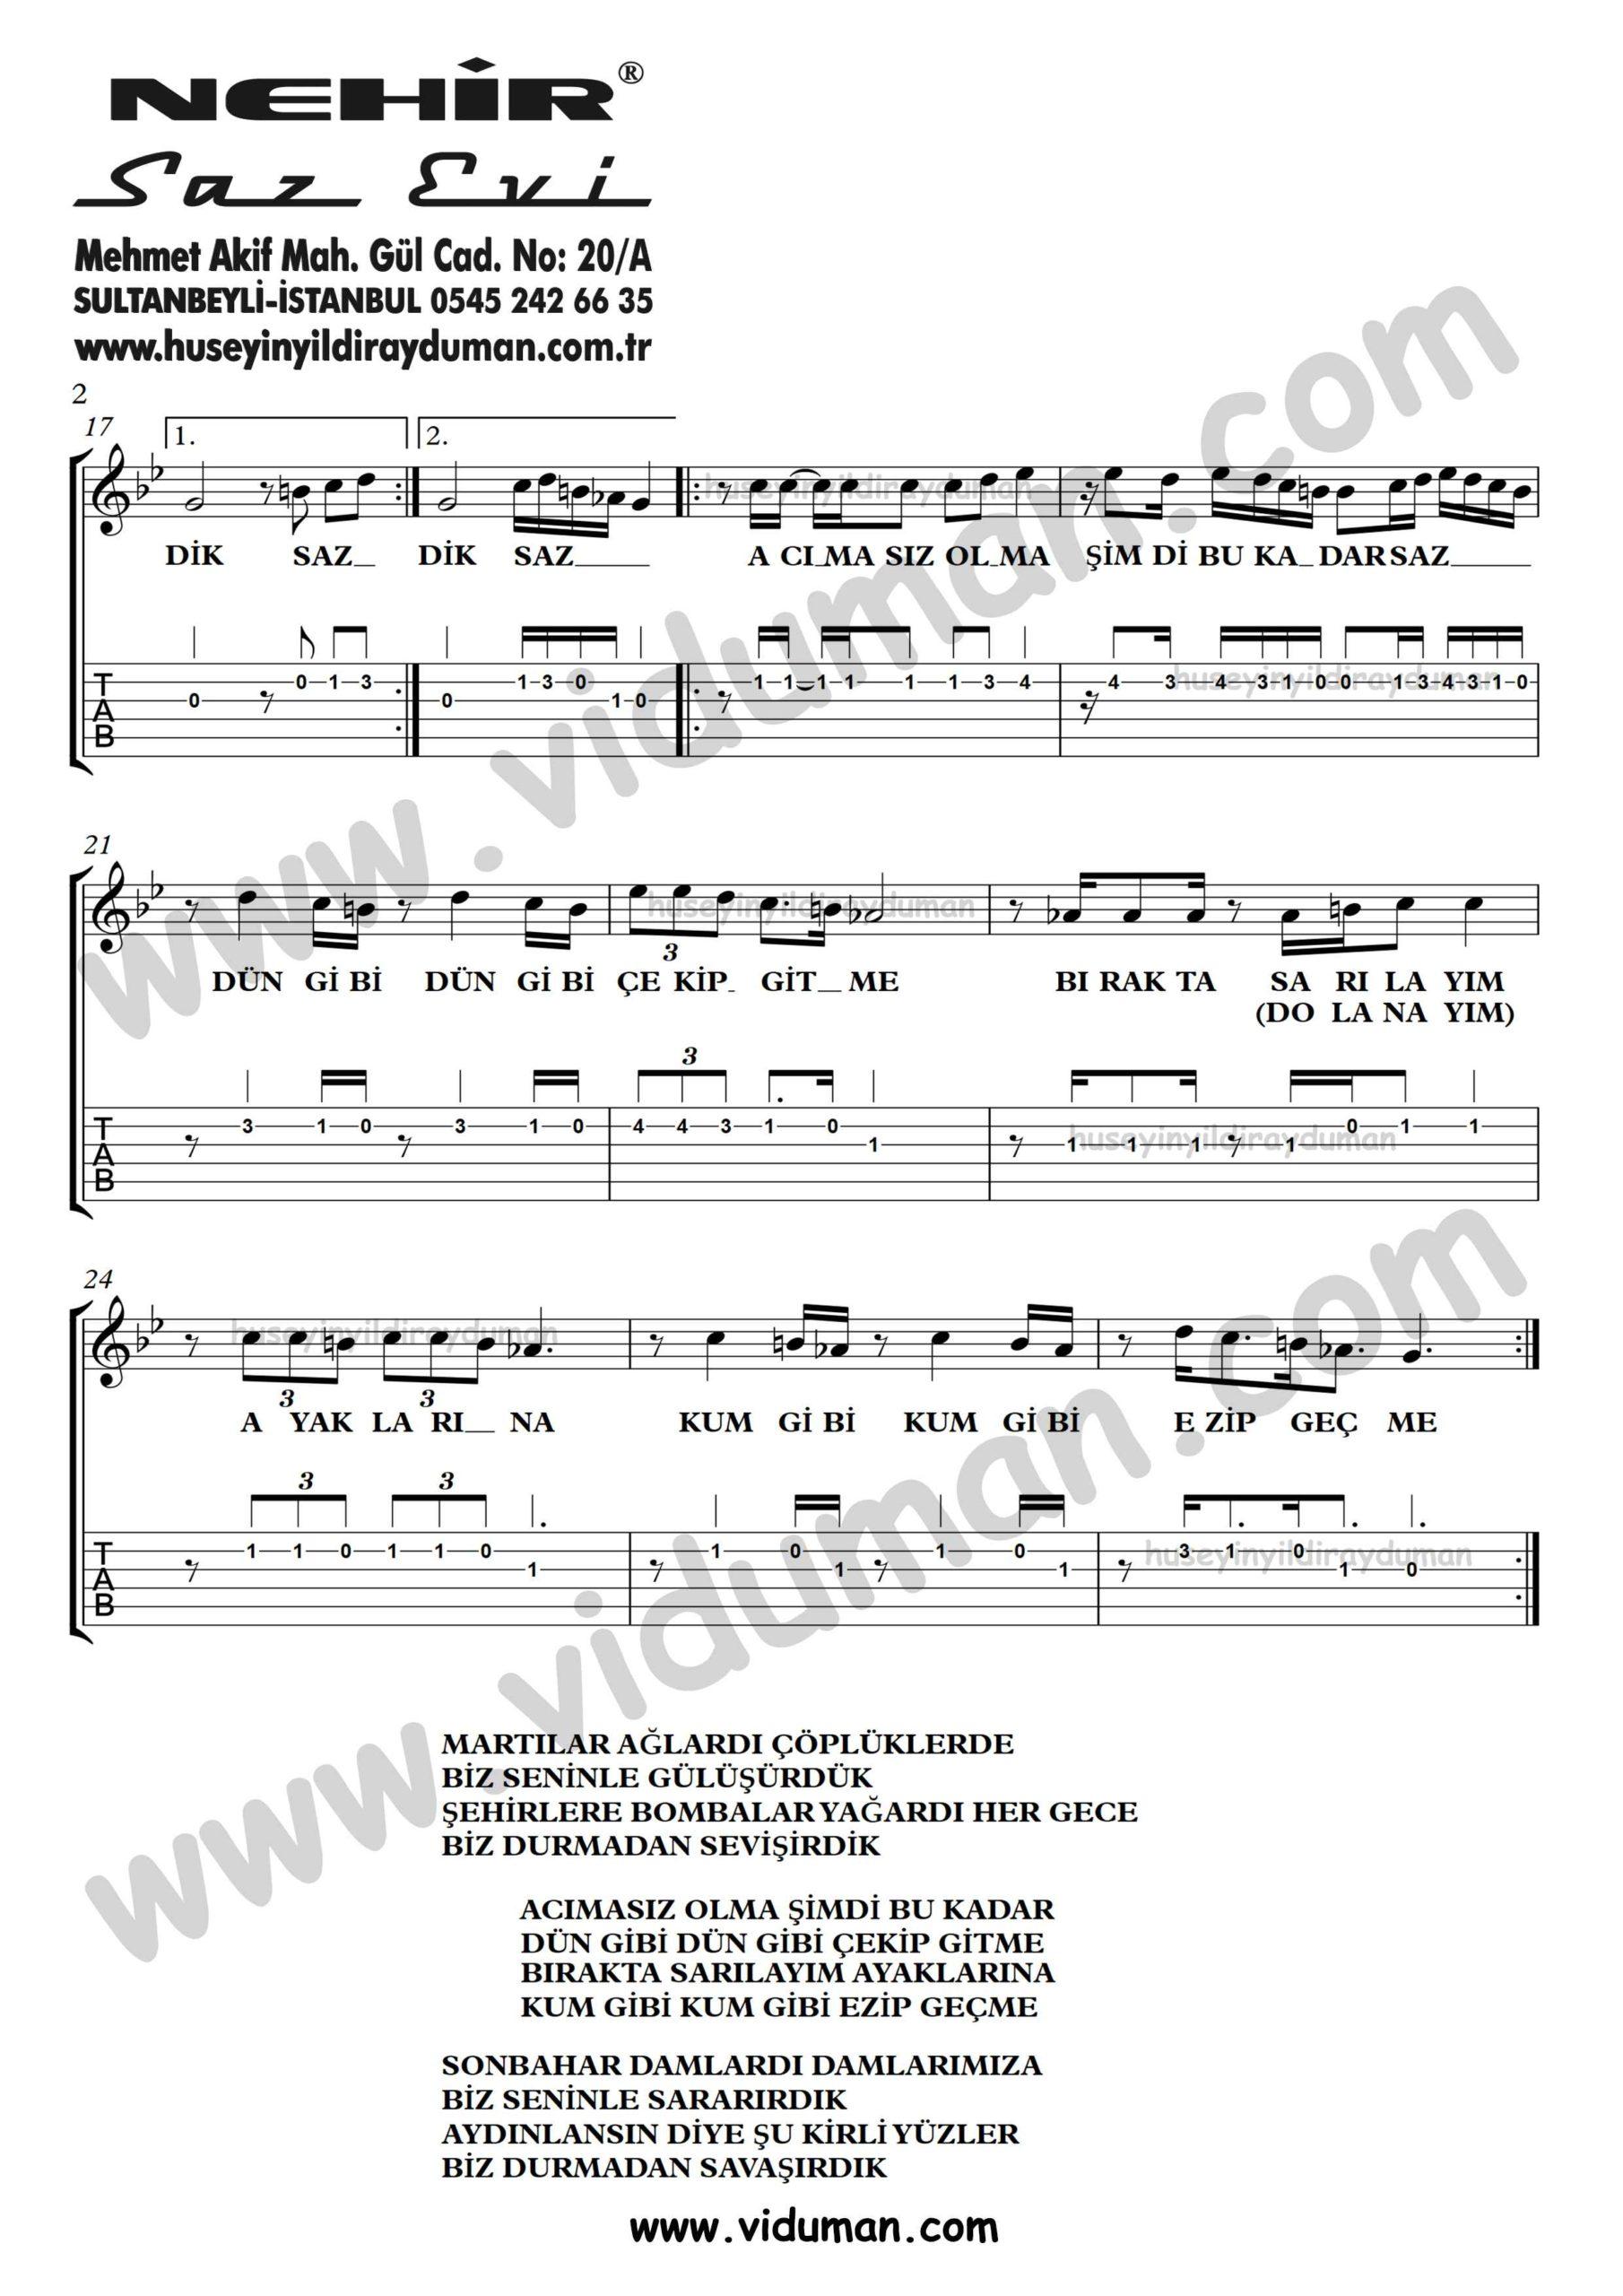 Kum Gibi_2-Ahmet Kaya-Gitar Tab-Solo Notalari